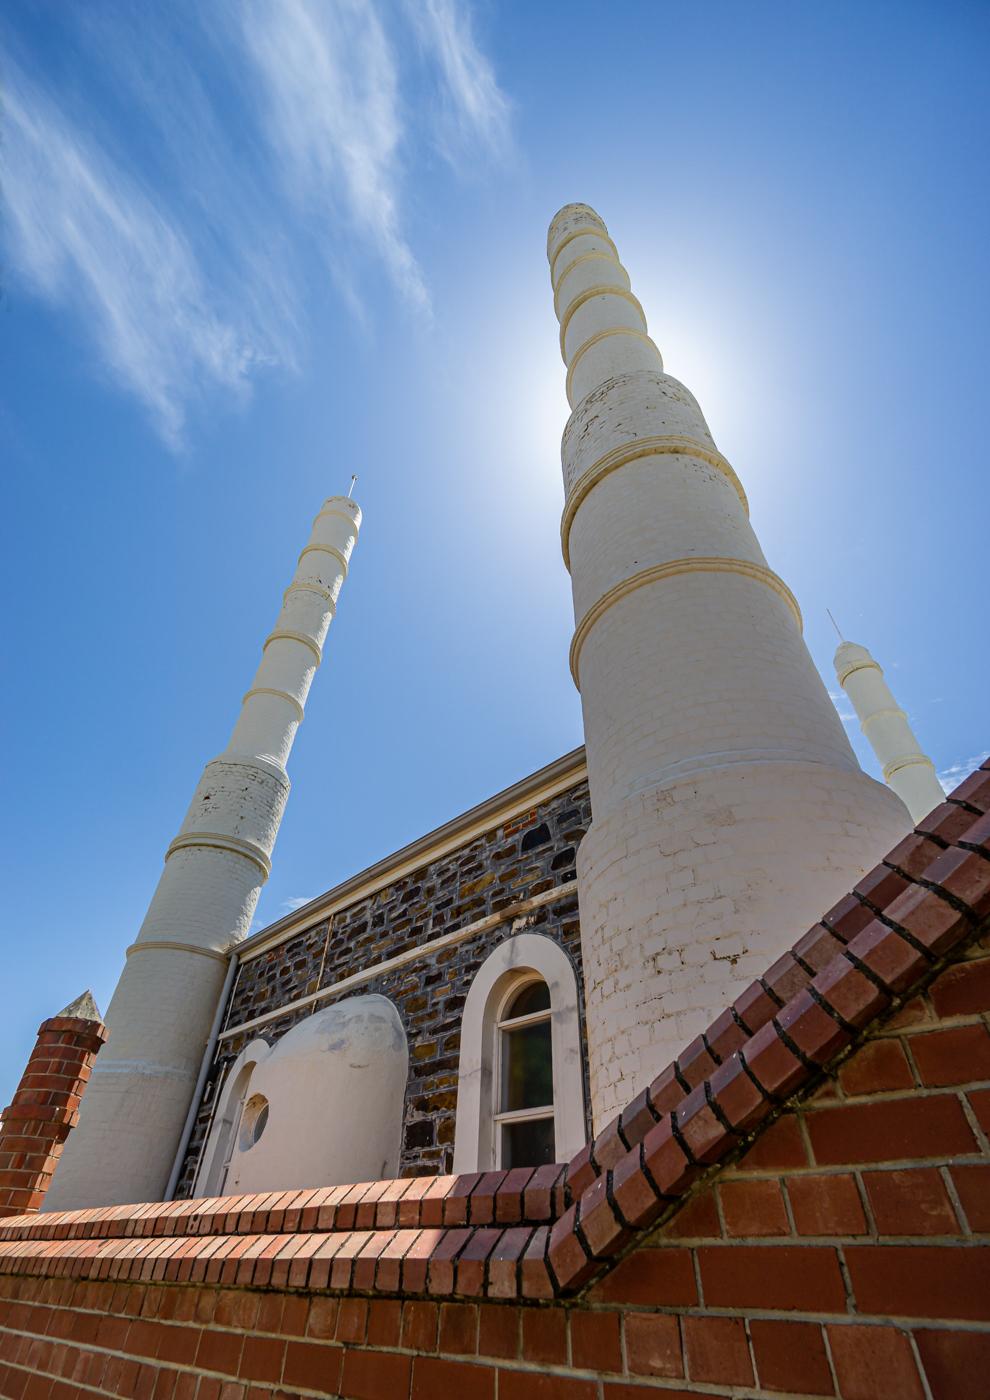 Adelaide Central Mosque, Australia